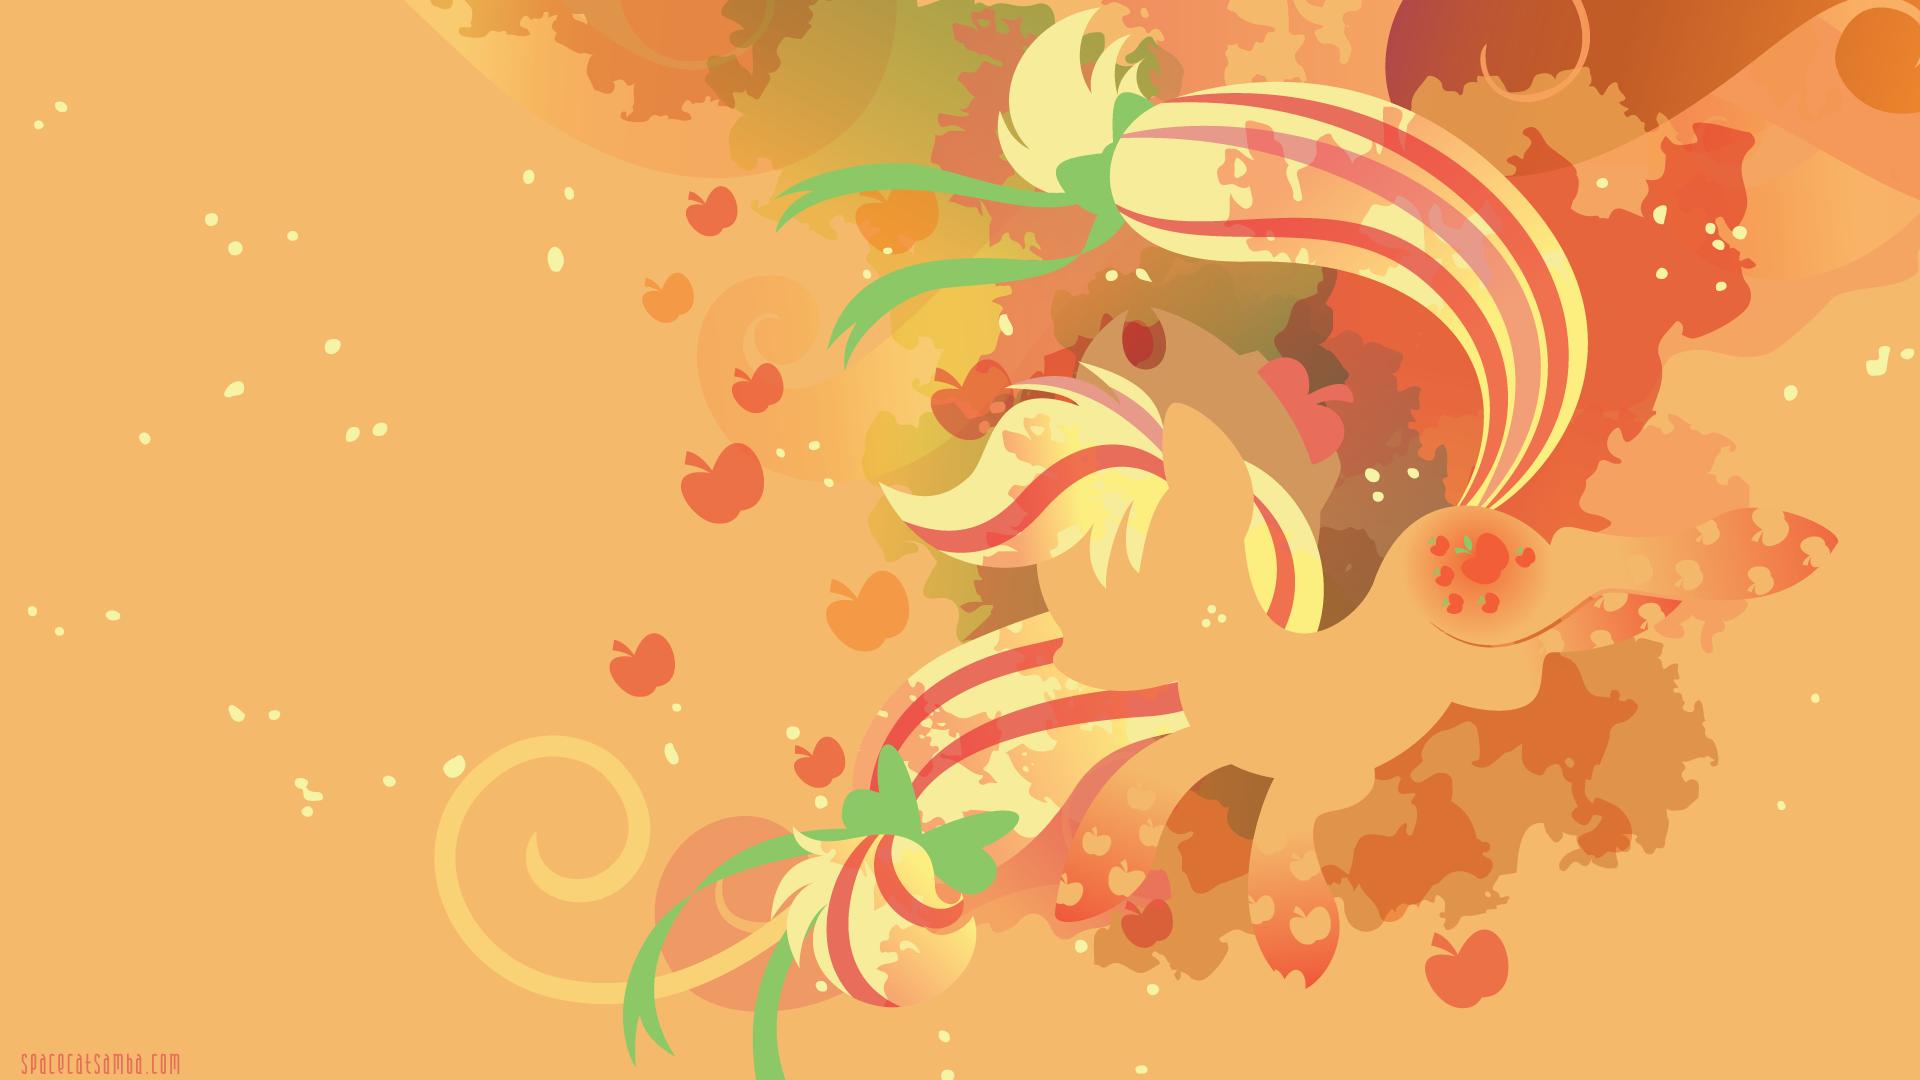 rainbow power applejack silhouette wall   Applejack My Little Pony 1920x1080